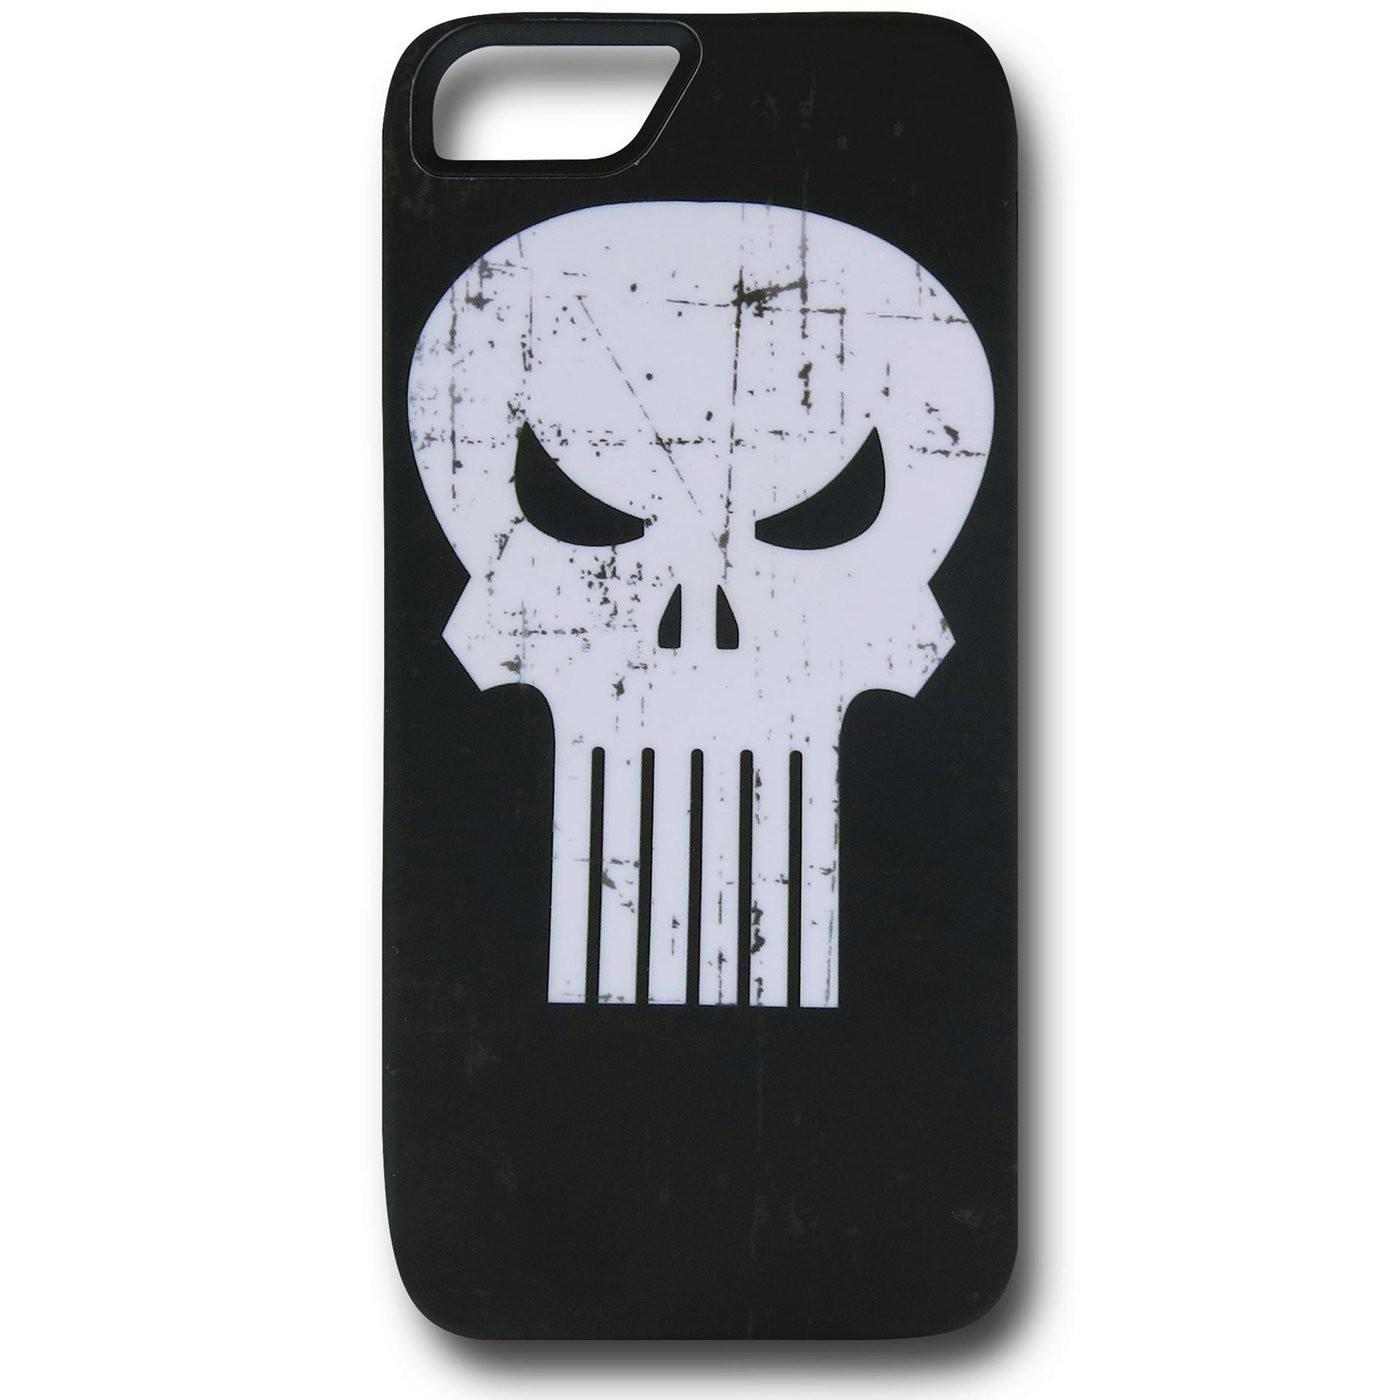 Punisher Symbol iPhone 5 Case